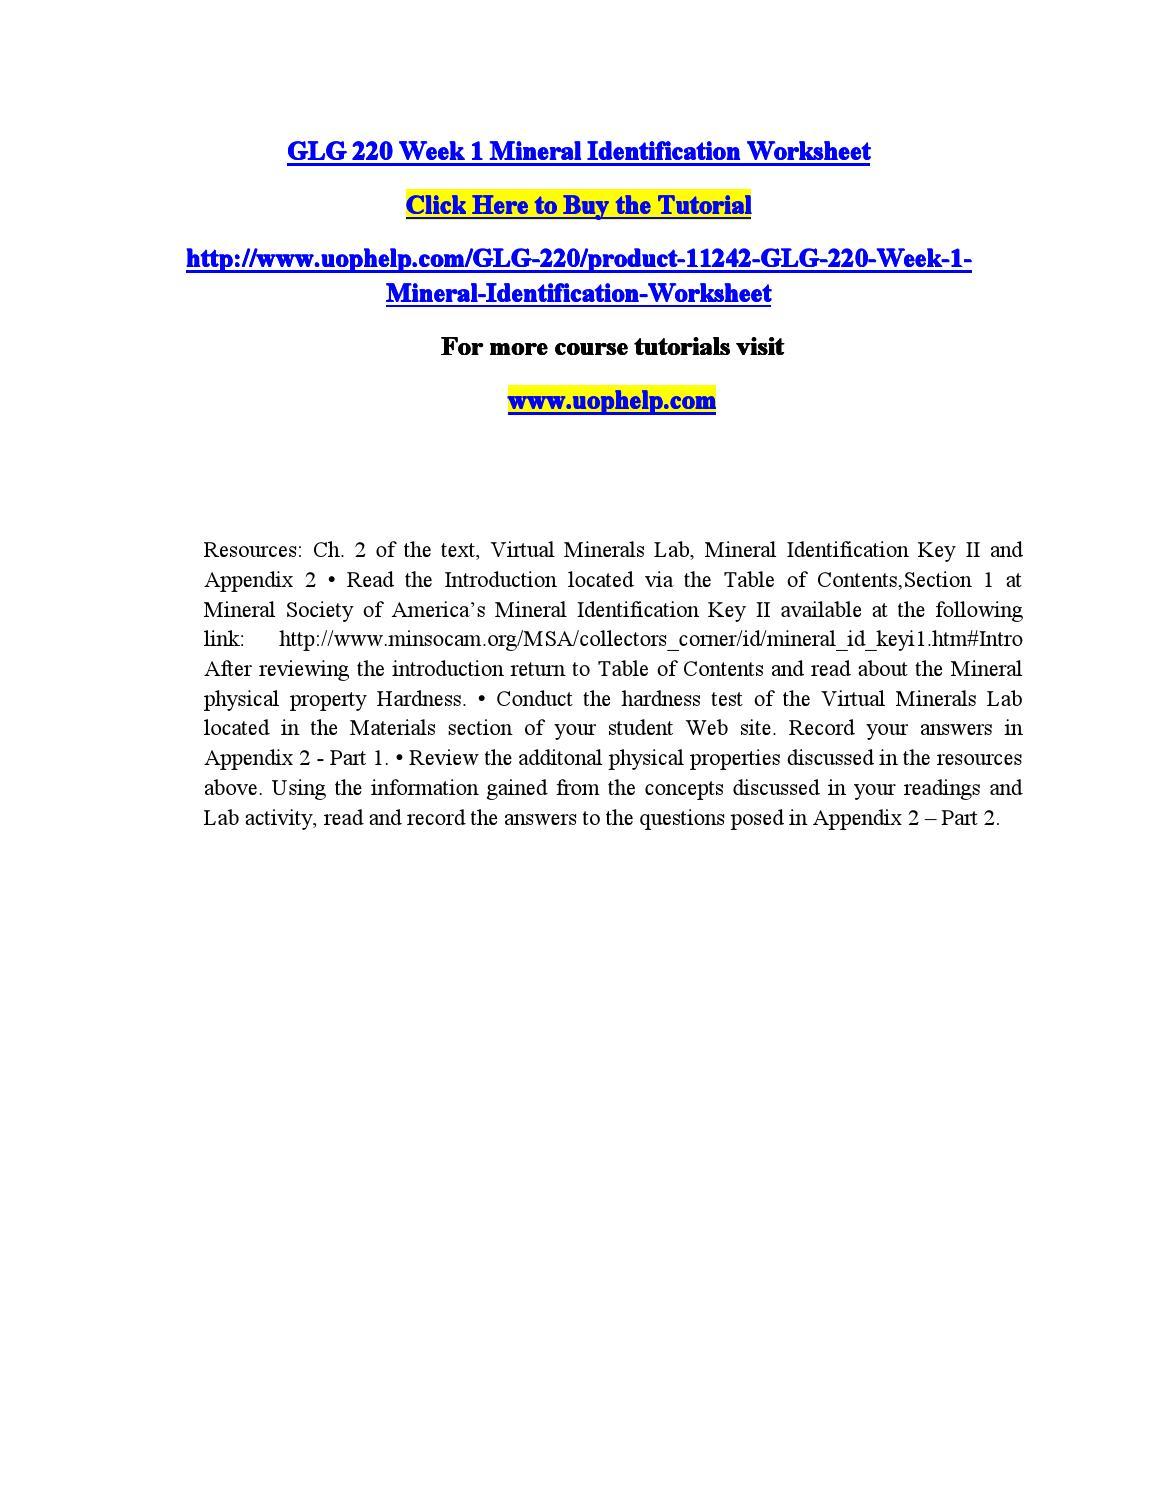 Glg 220 week 1 mineral identification worksheet by drepork issuu